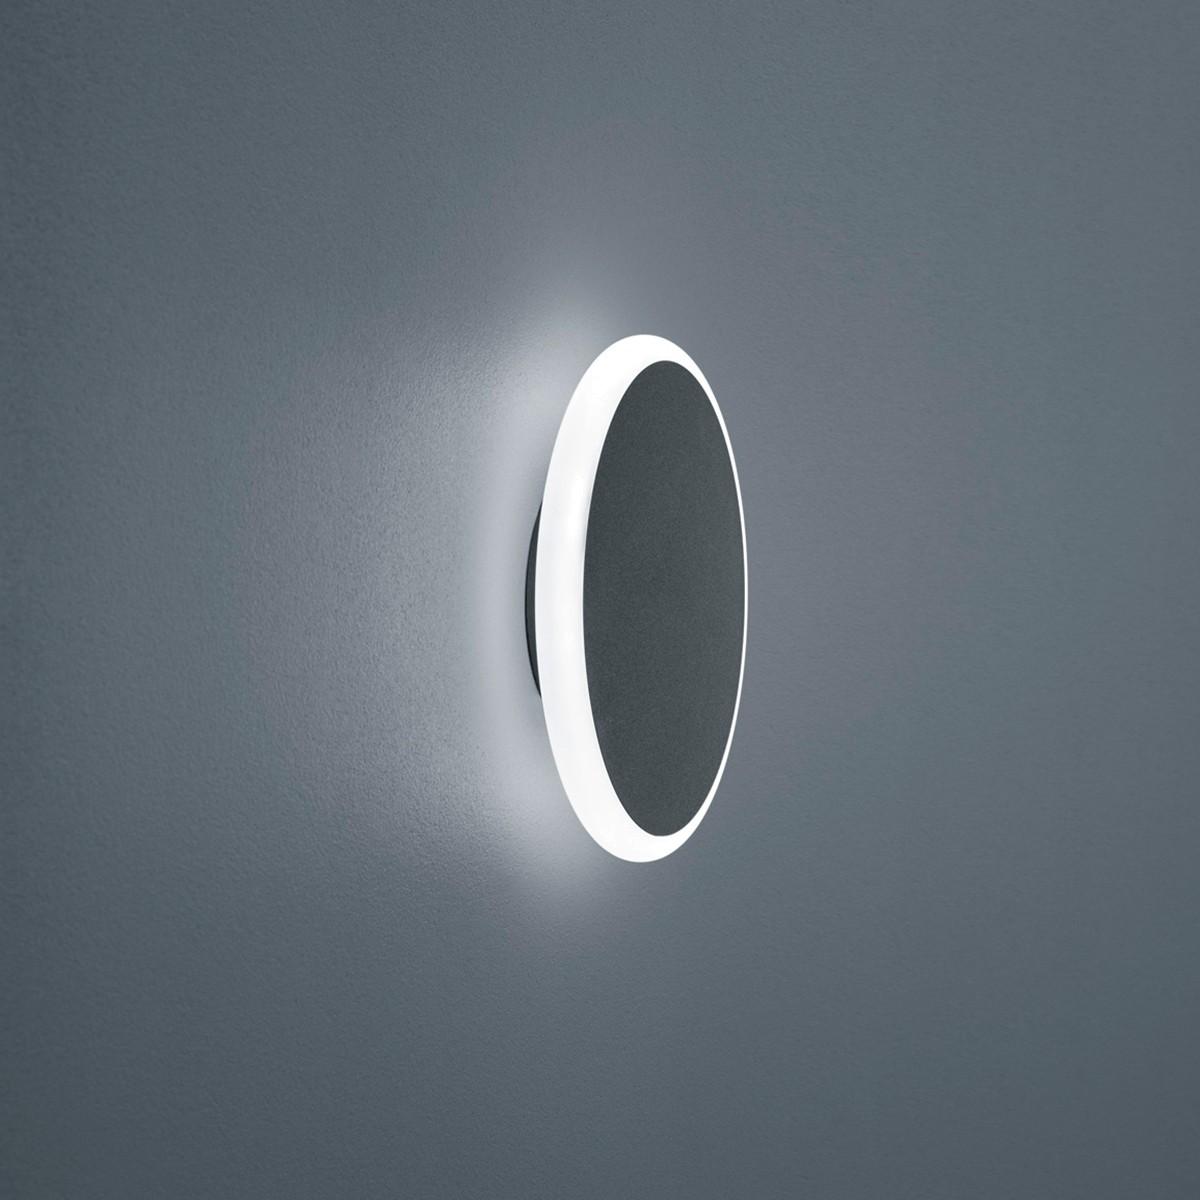 Helestra Solo LED Außenwandleuchte, graphit